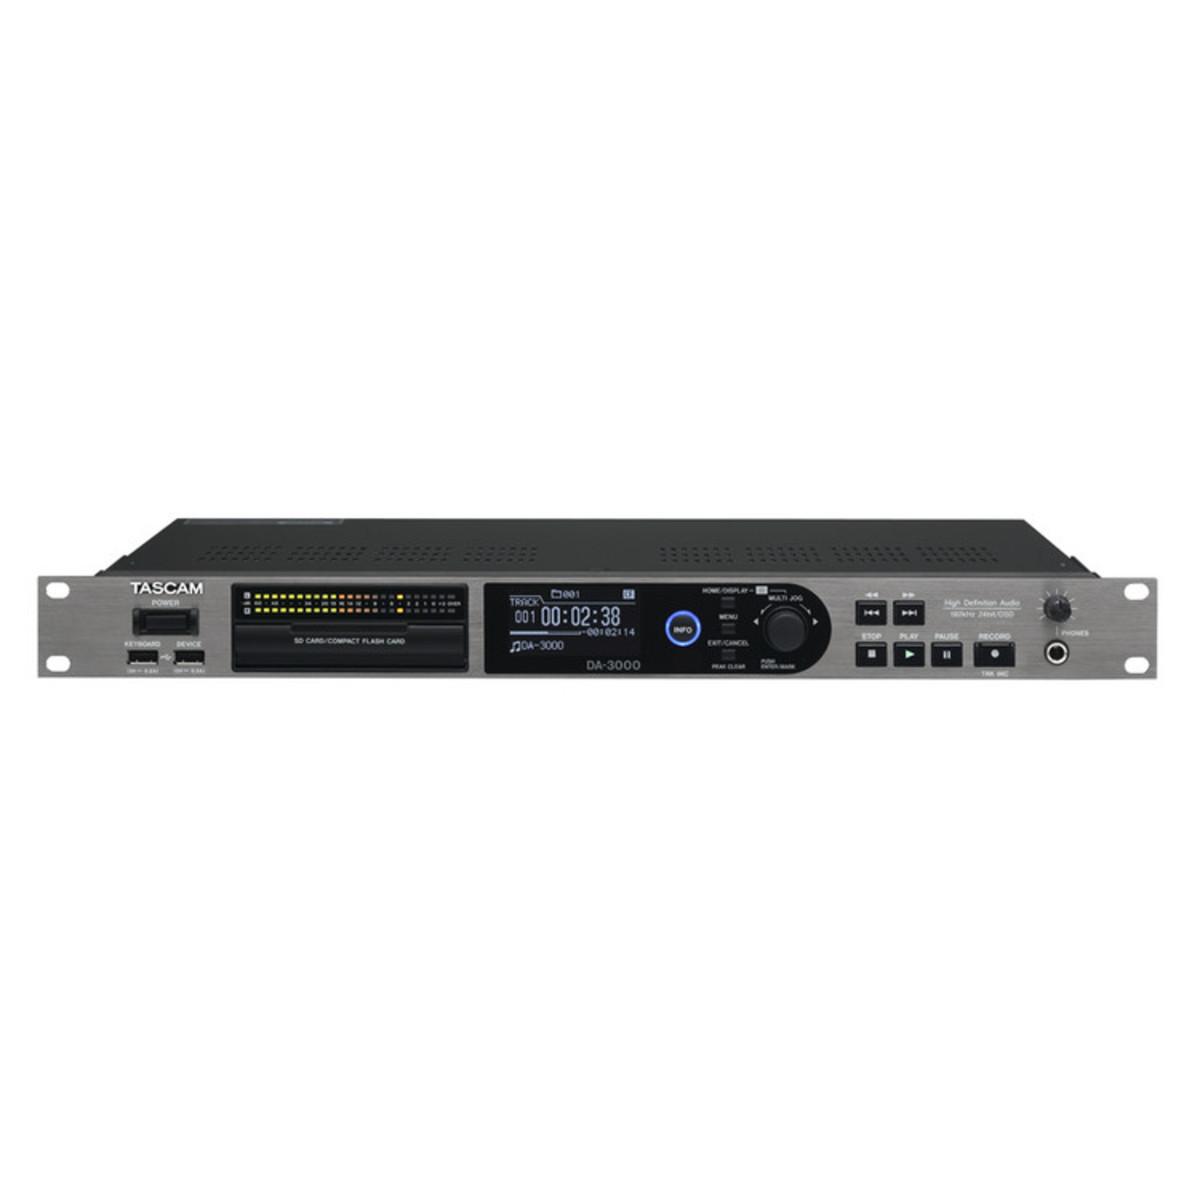 Tascam Da 3000 2 Channel High Definition Audio Recorder At Gear4music Circuitdiagram Addaconvertercircuit Adconverter 16bitad